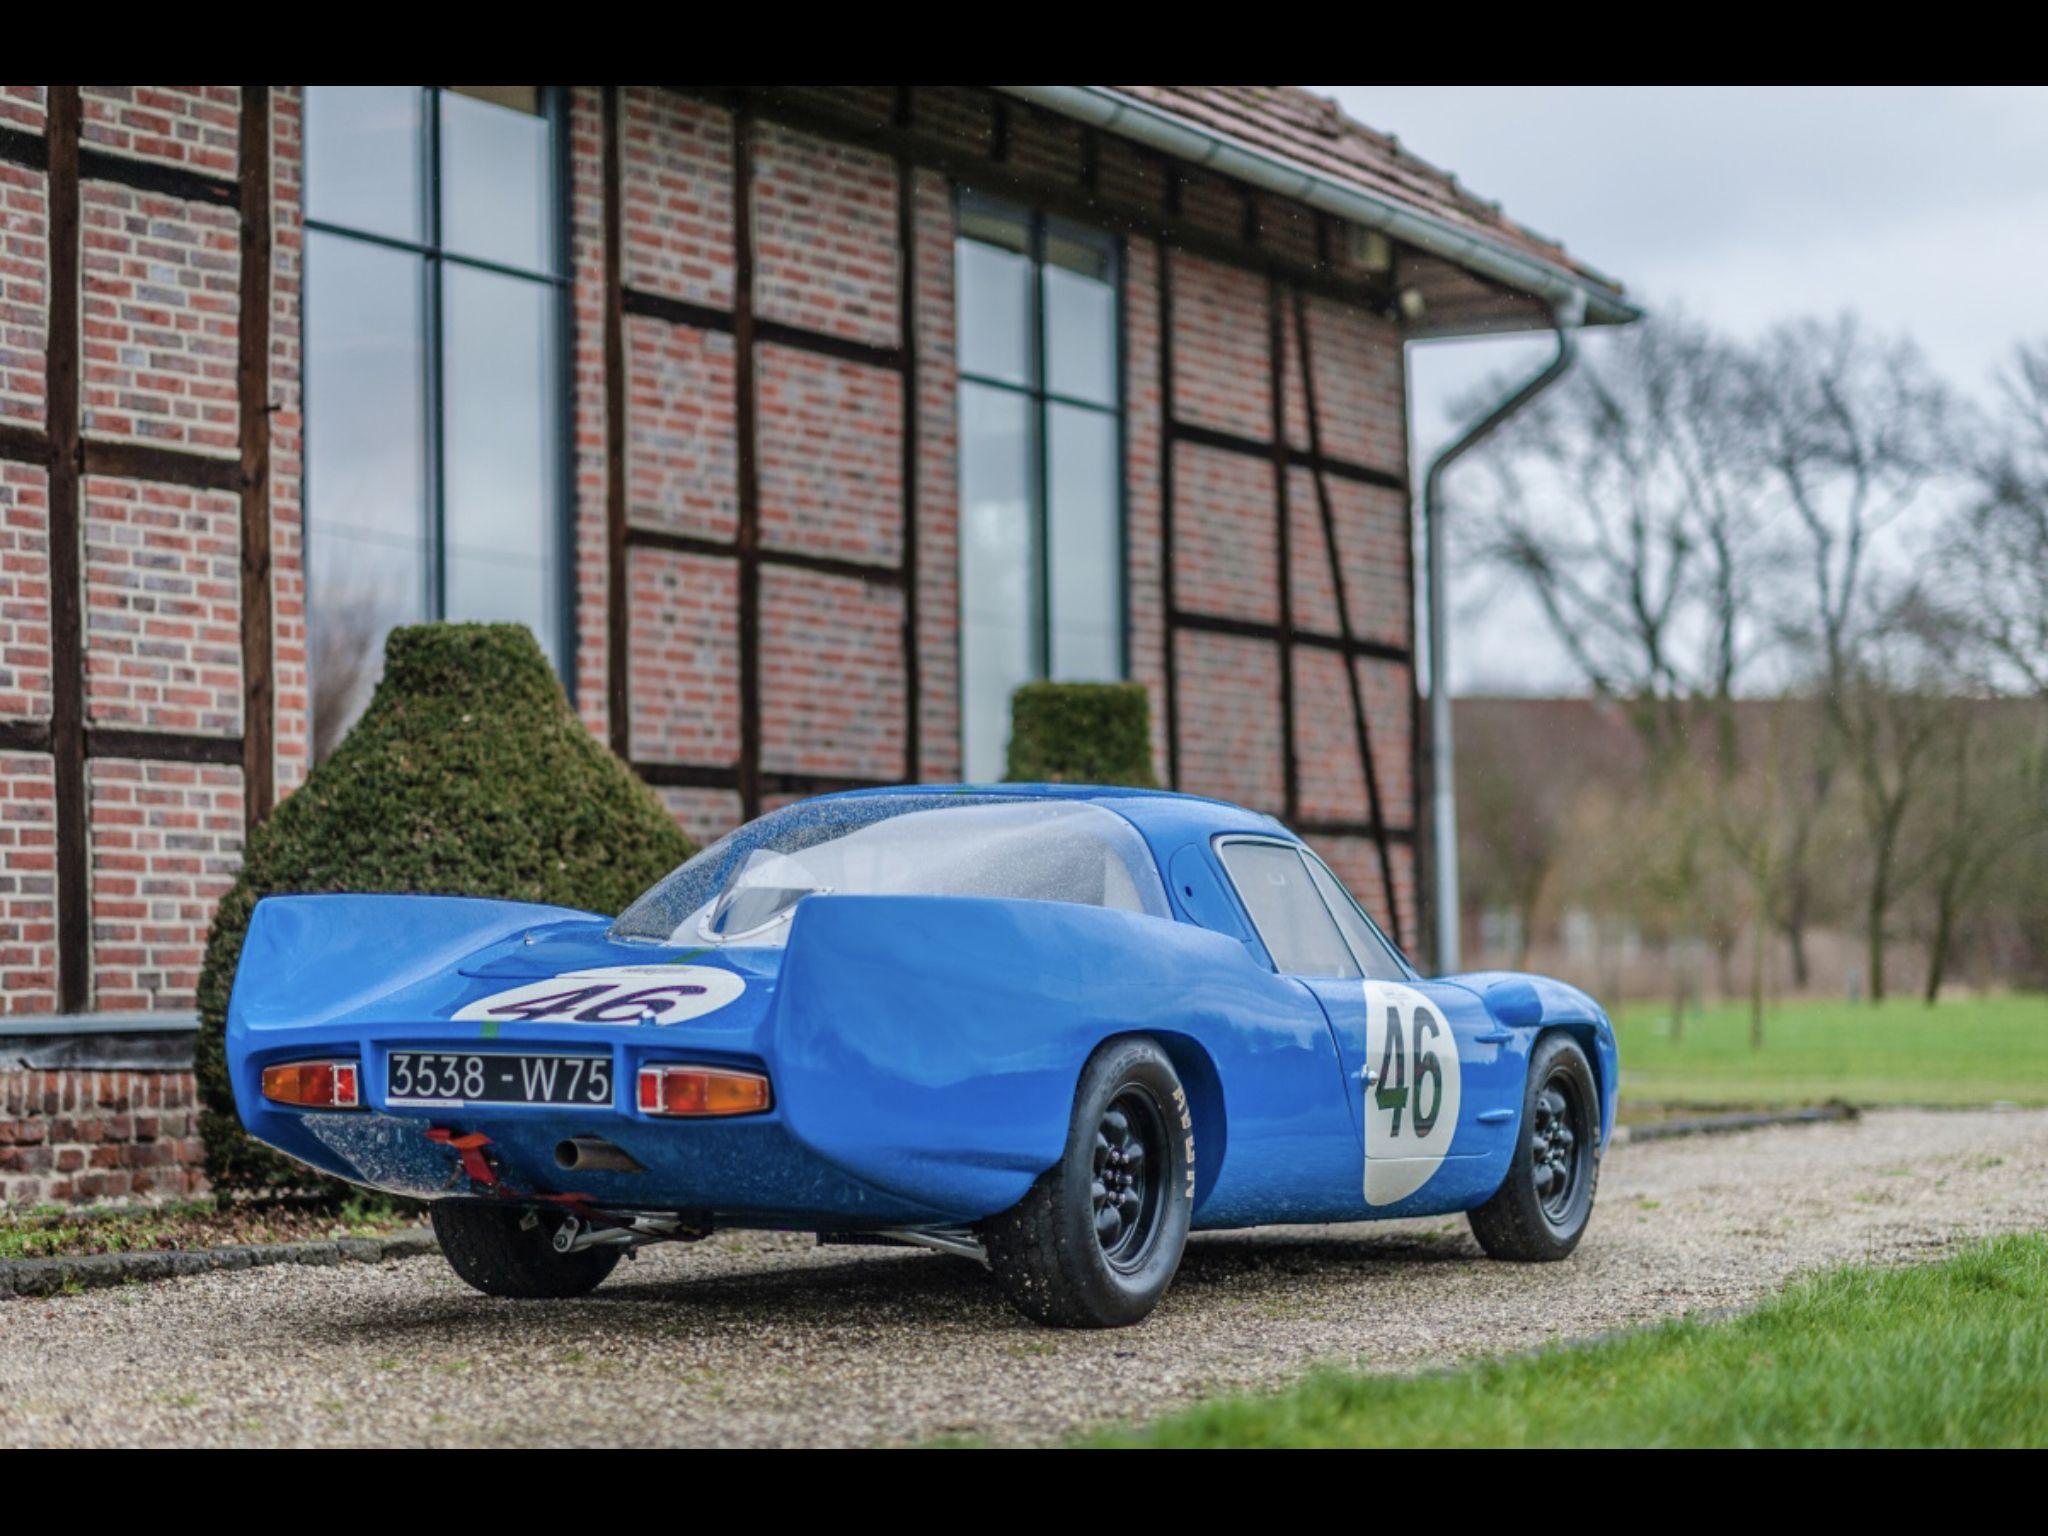 1964 Alpine A210 M64 Ex Work Le Mans Car Car Guys Car Vintage Racing